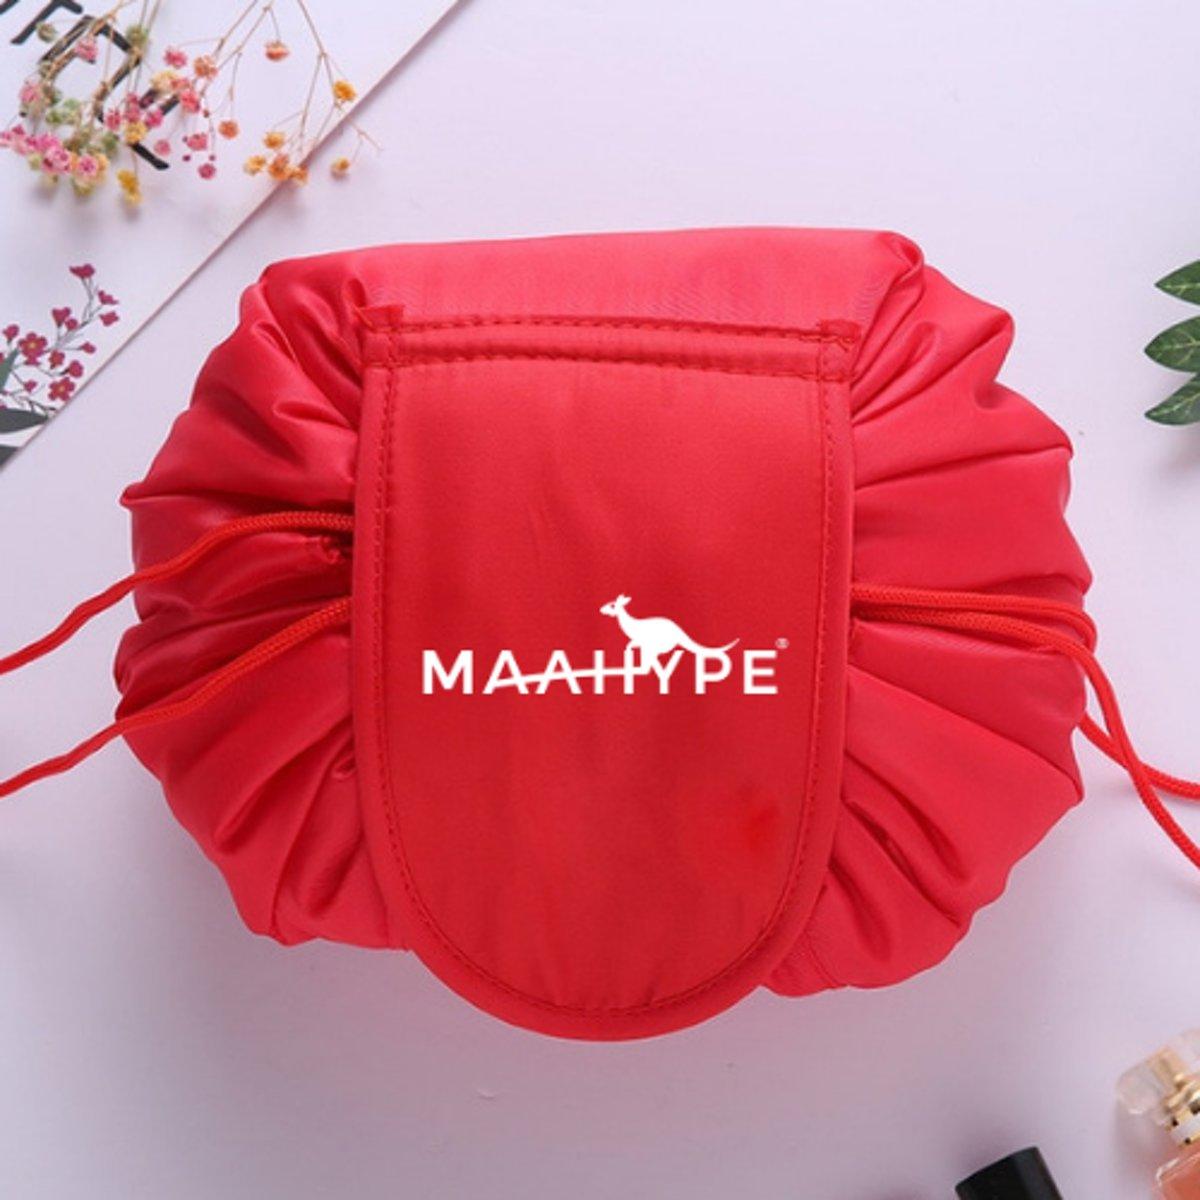 MaaHype Make-up organiser - Makeup opbergen - Accesoires organiser - Opbergsysteem - Reis toilettas - rood kopen